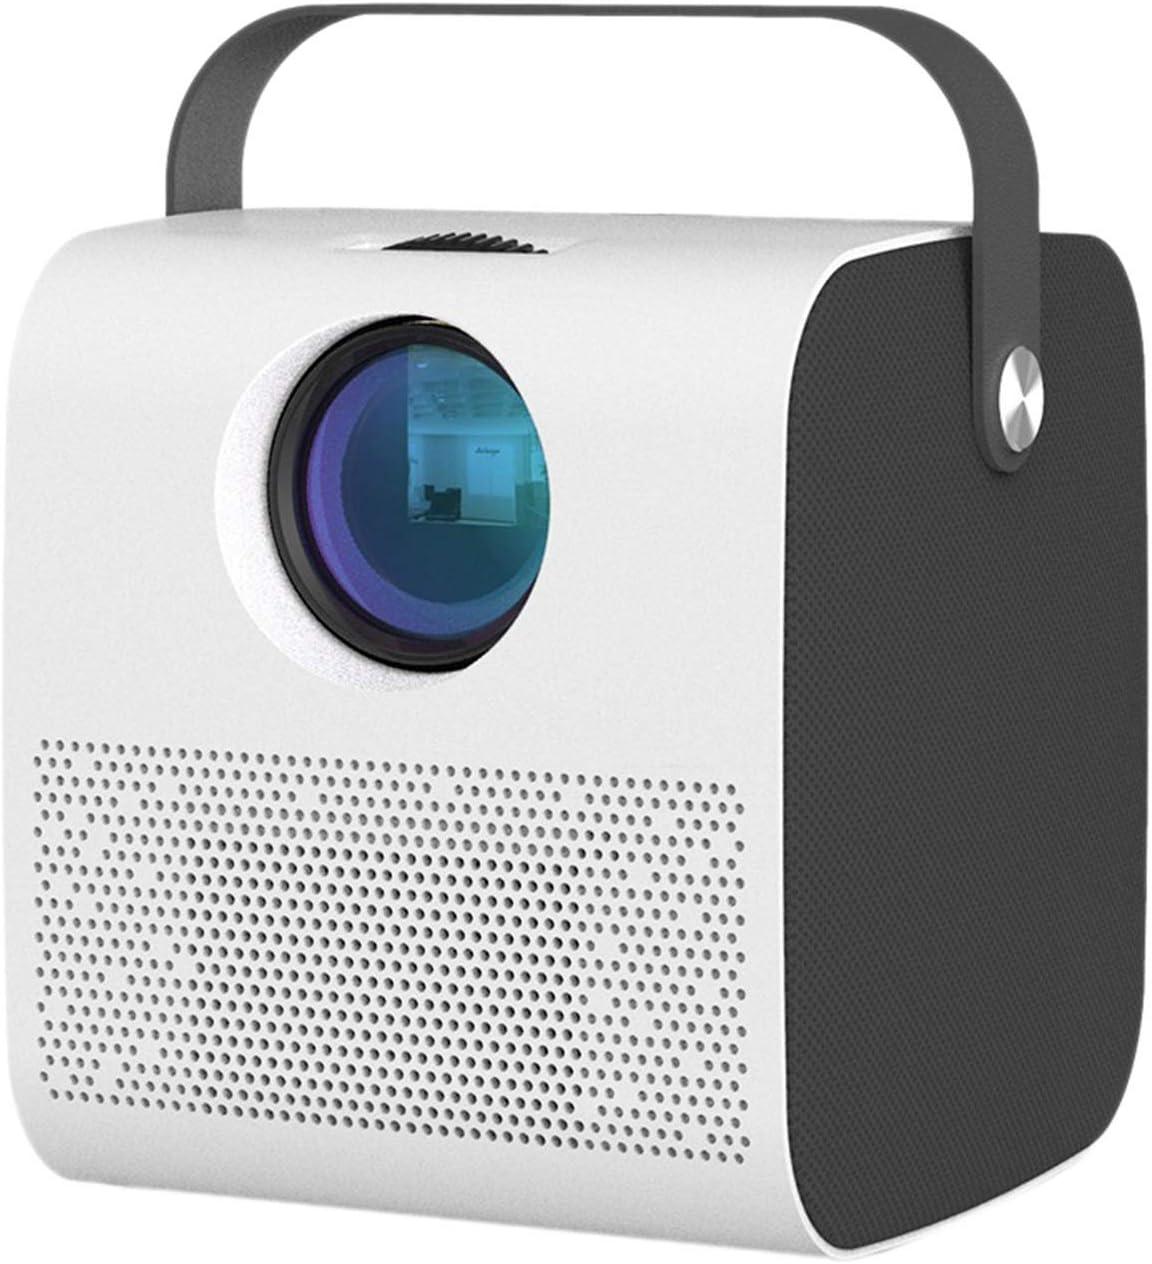 NILINMA Speaker P52 Smart Projector 1280X720 Super special price Portable HD Mobile Alternative dealer